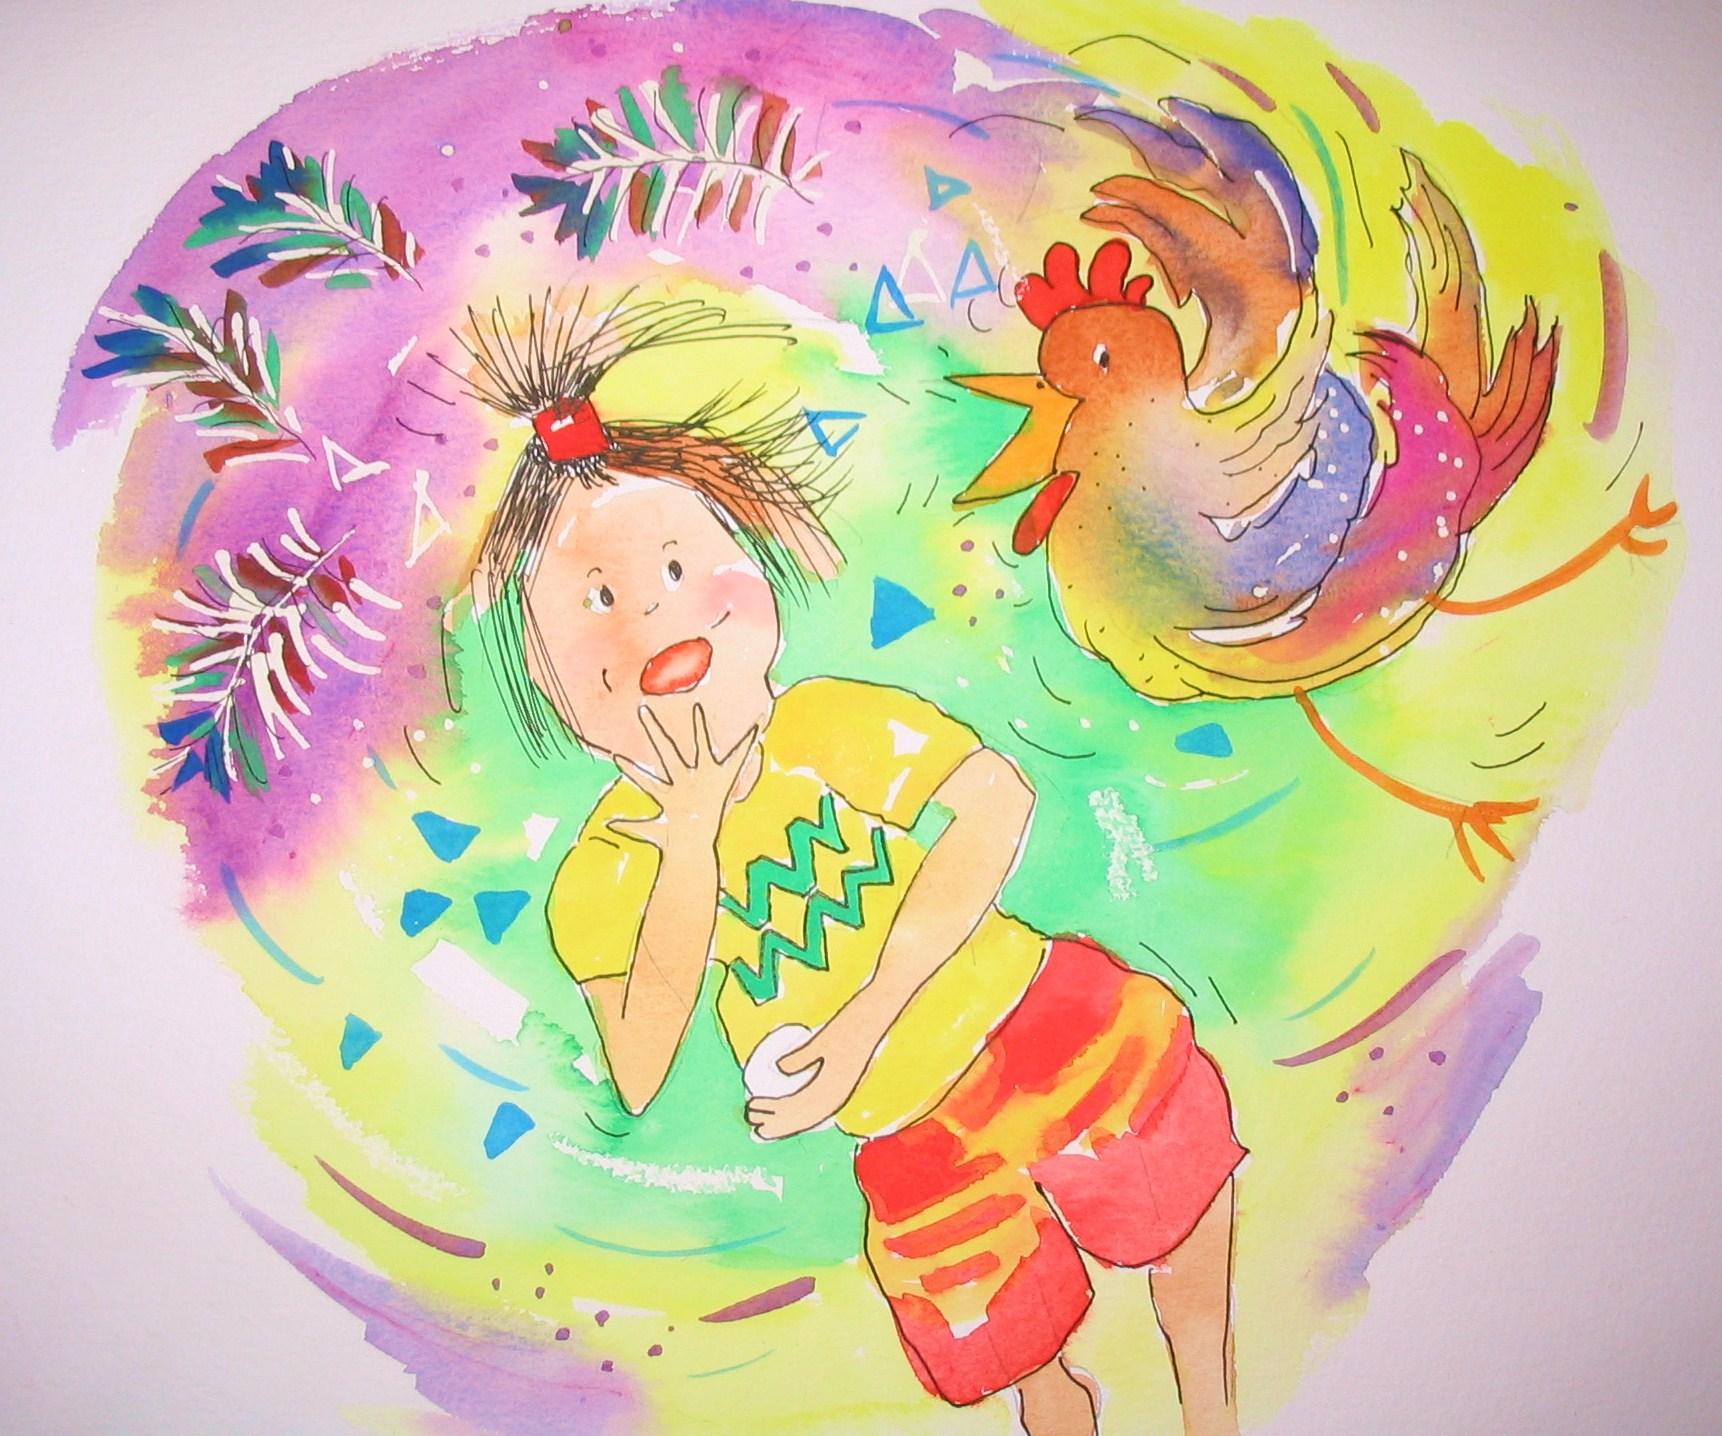 Karen scared of chickens! (Dennis & June)